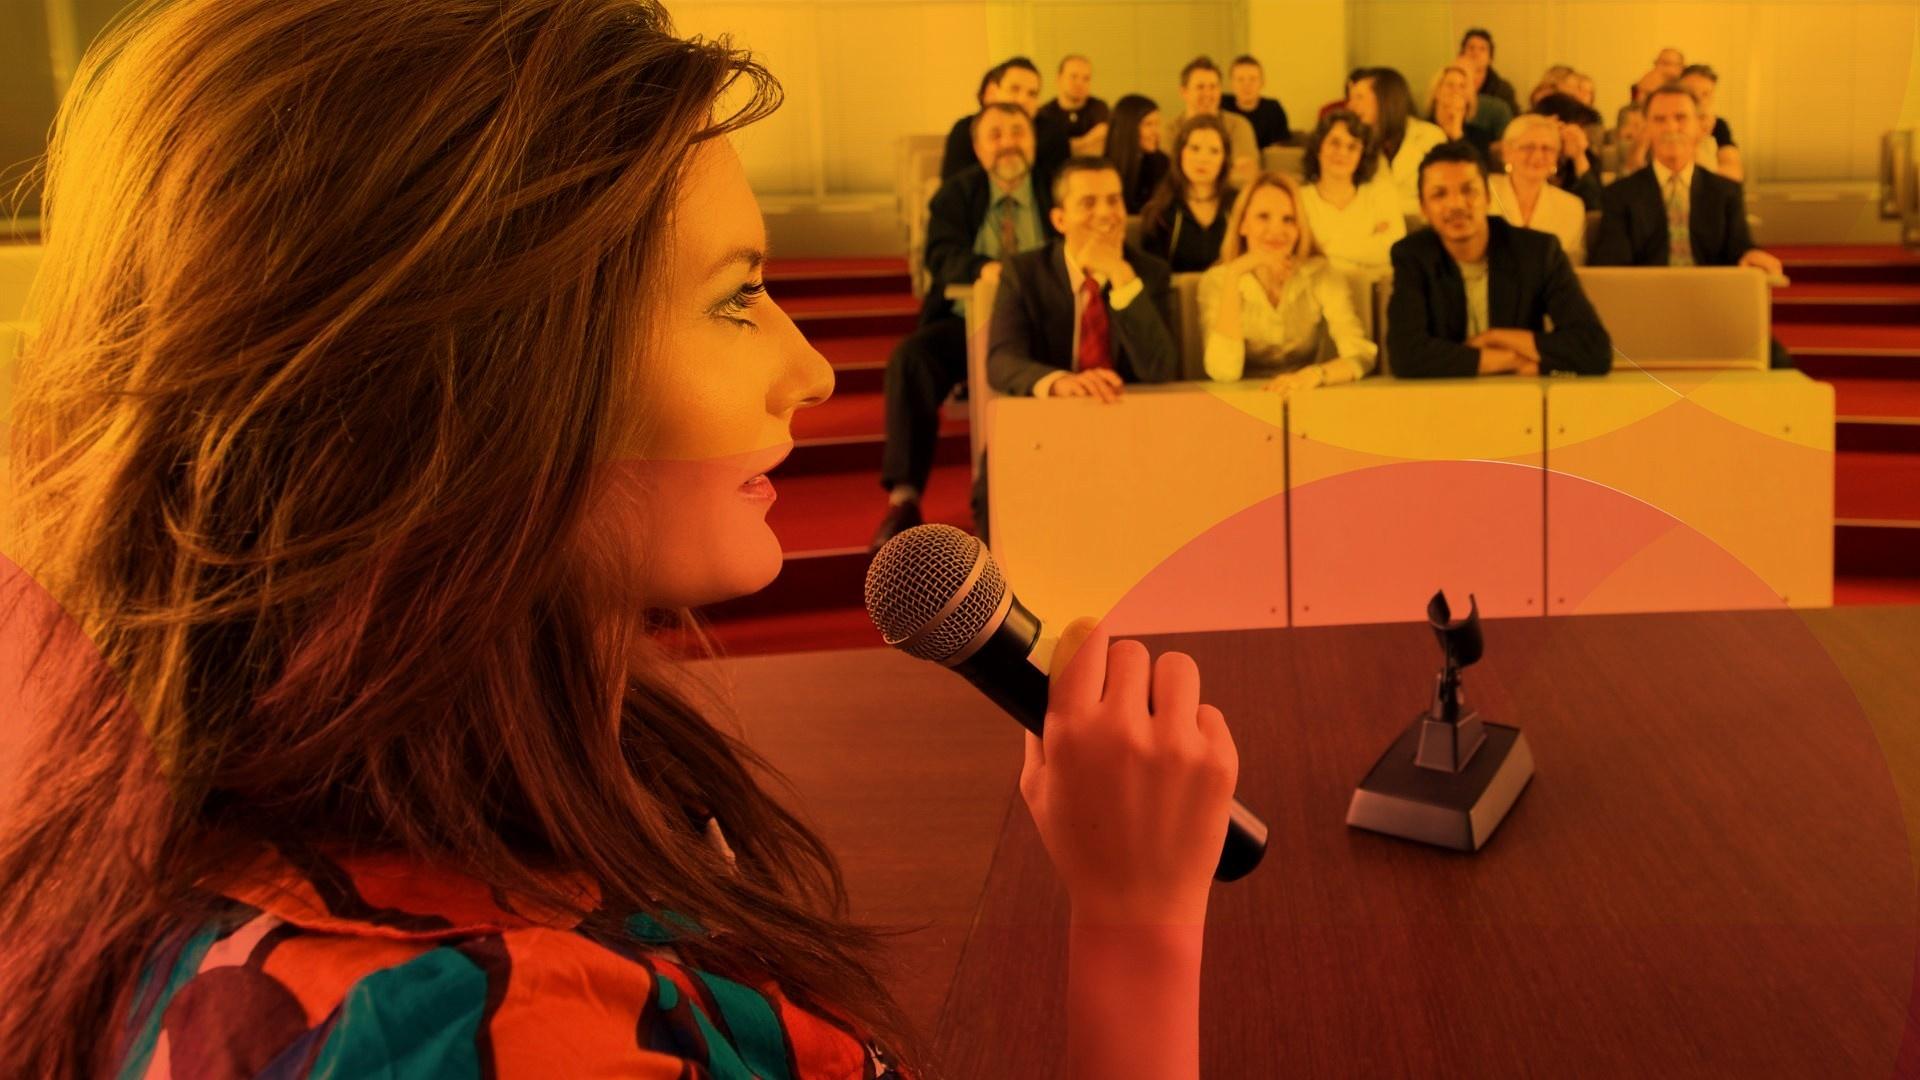 Presentation and public speaking